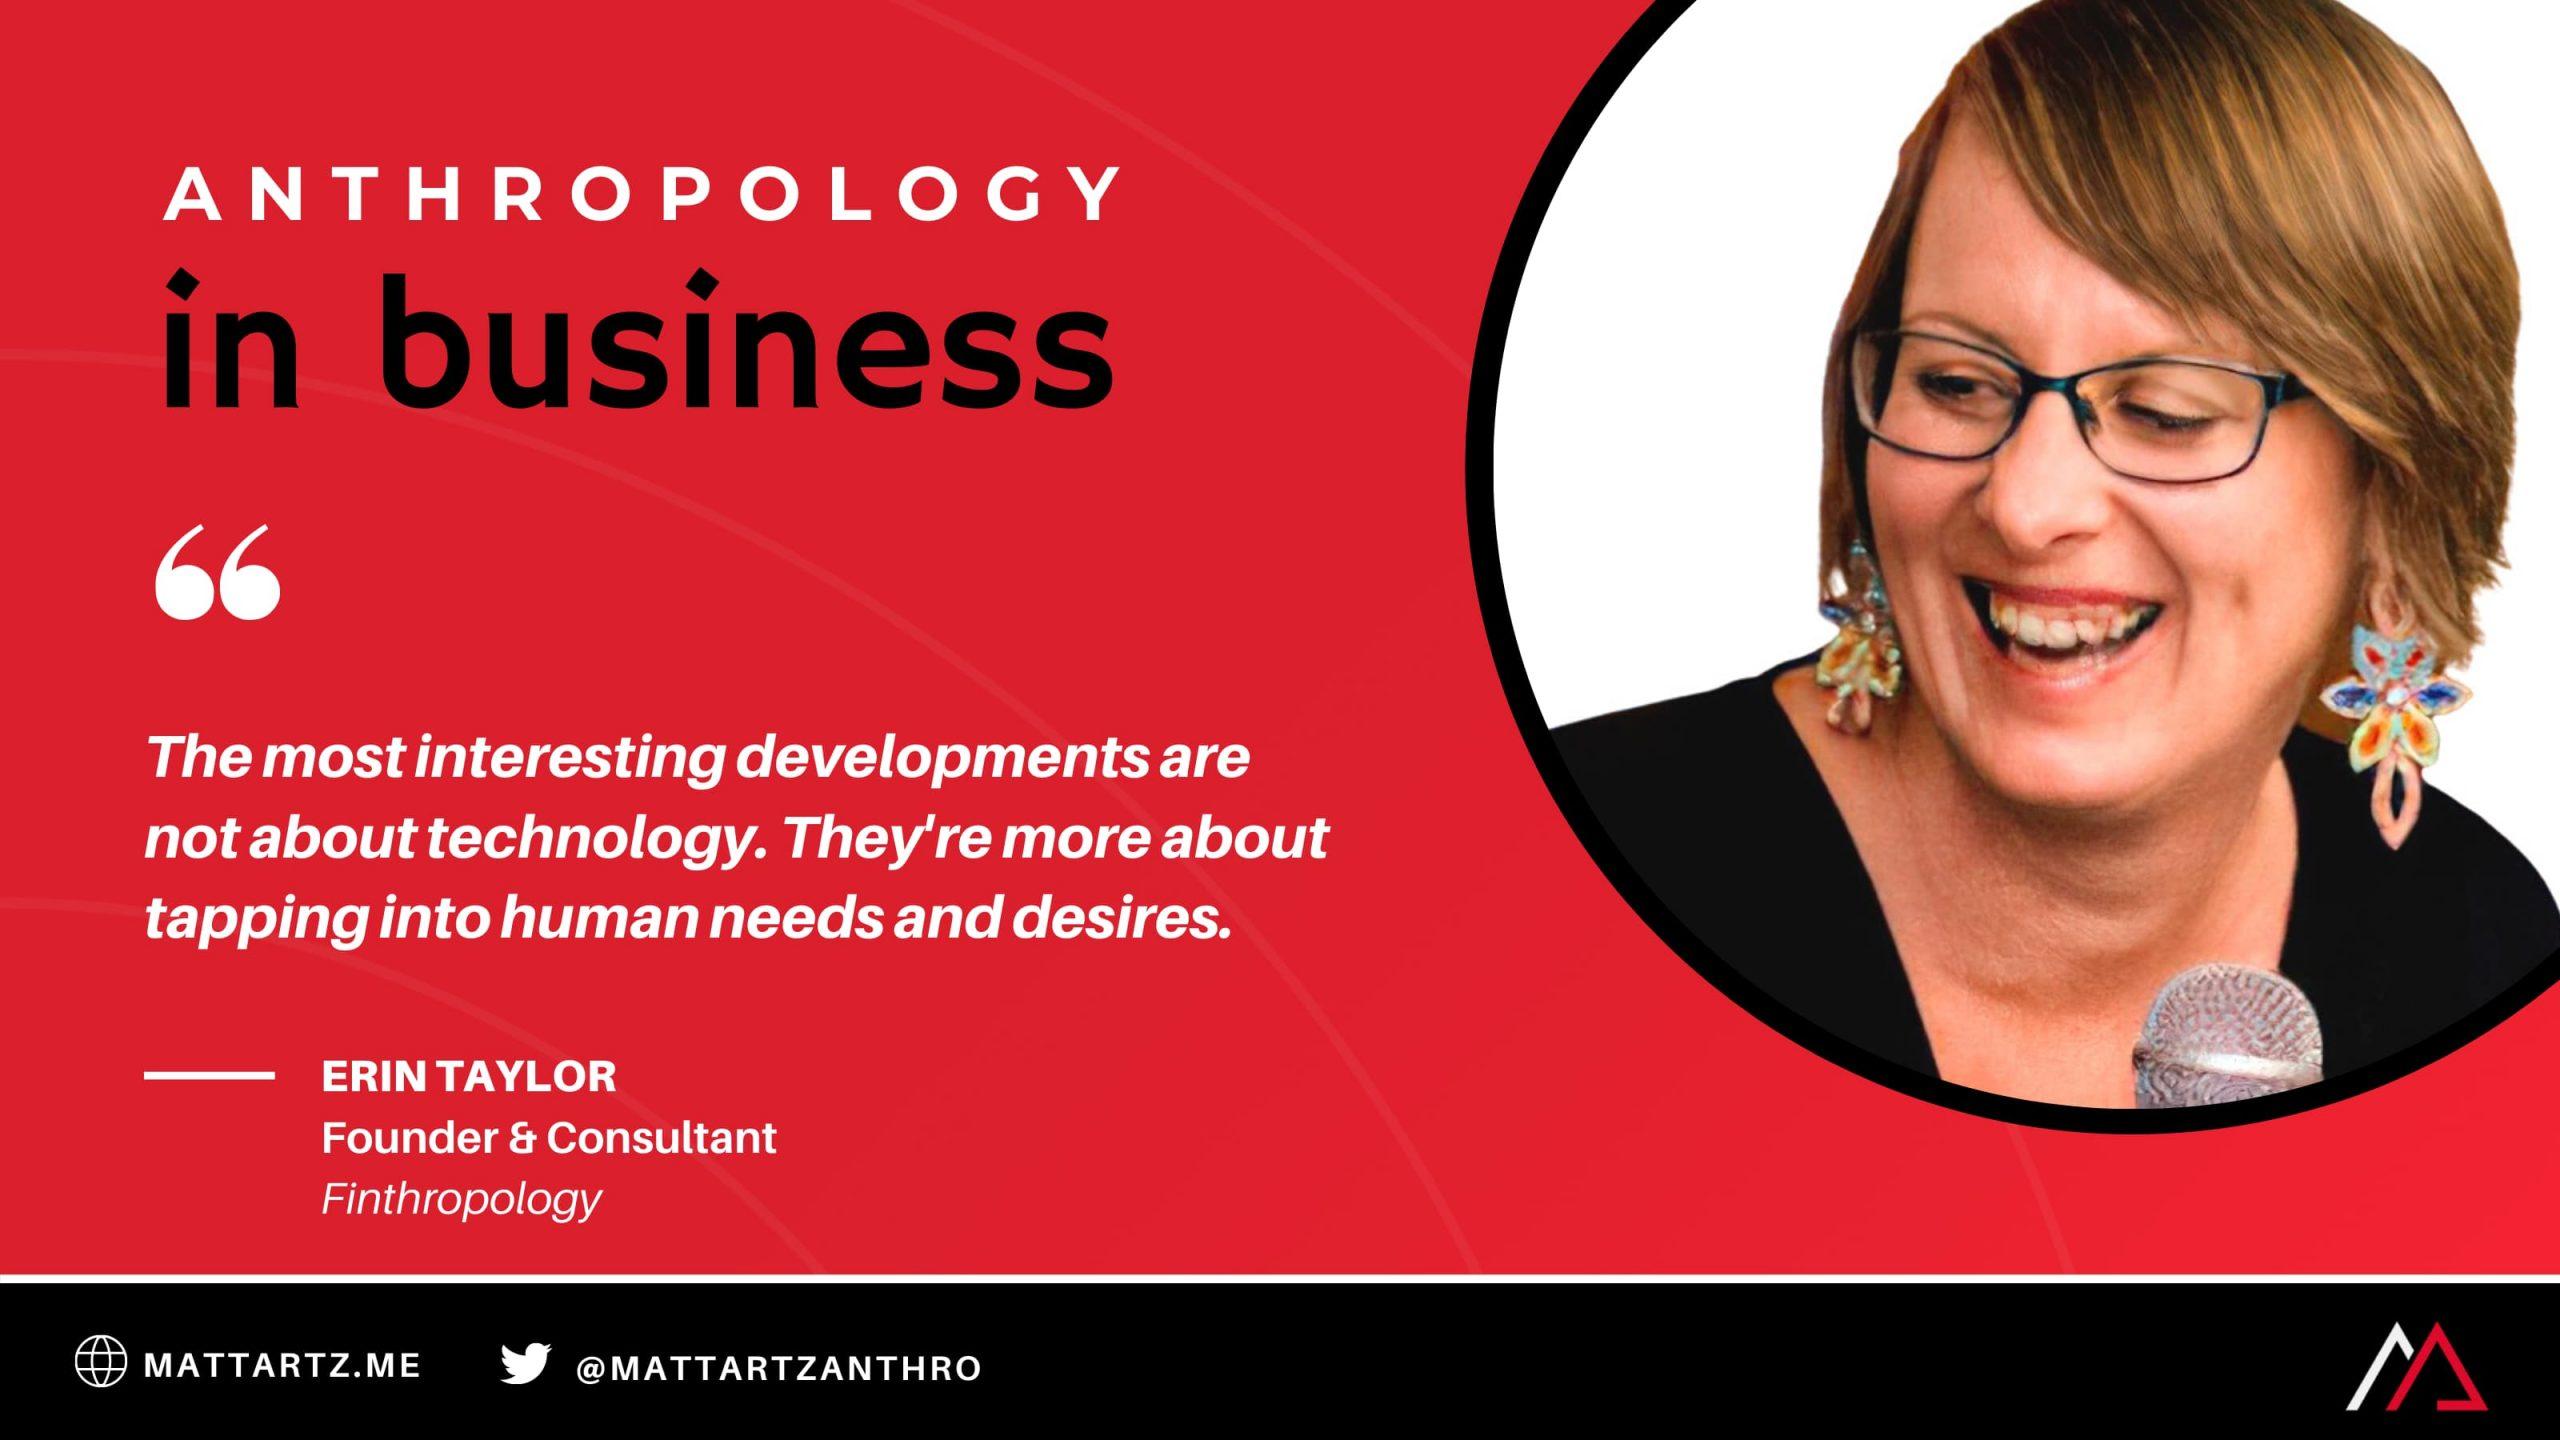 Erin Taylor Anthropology in Business with Matt Artz